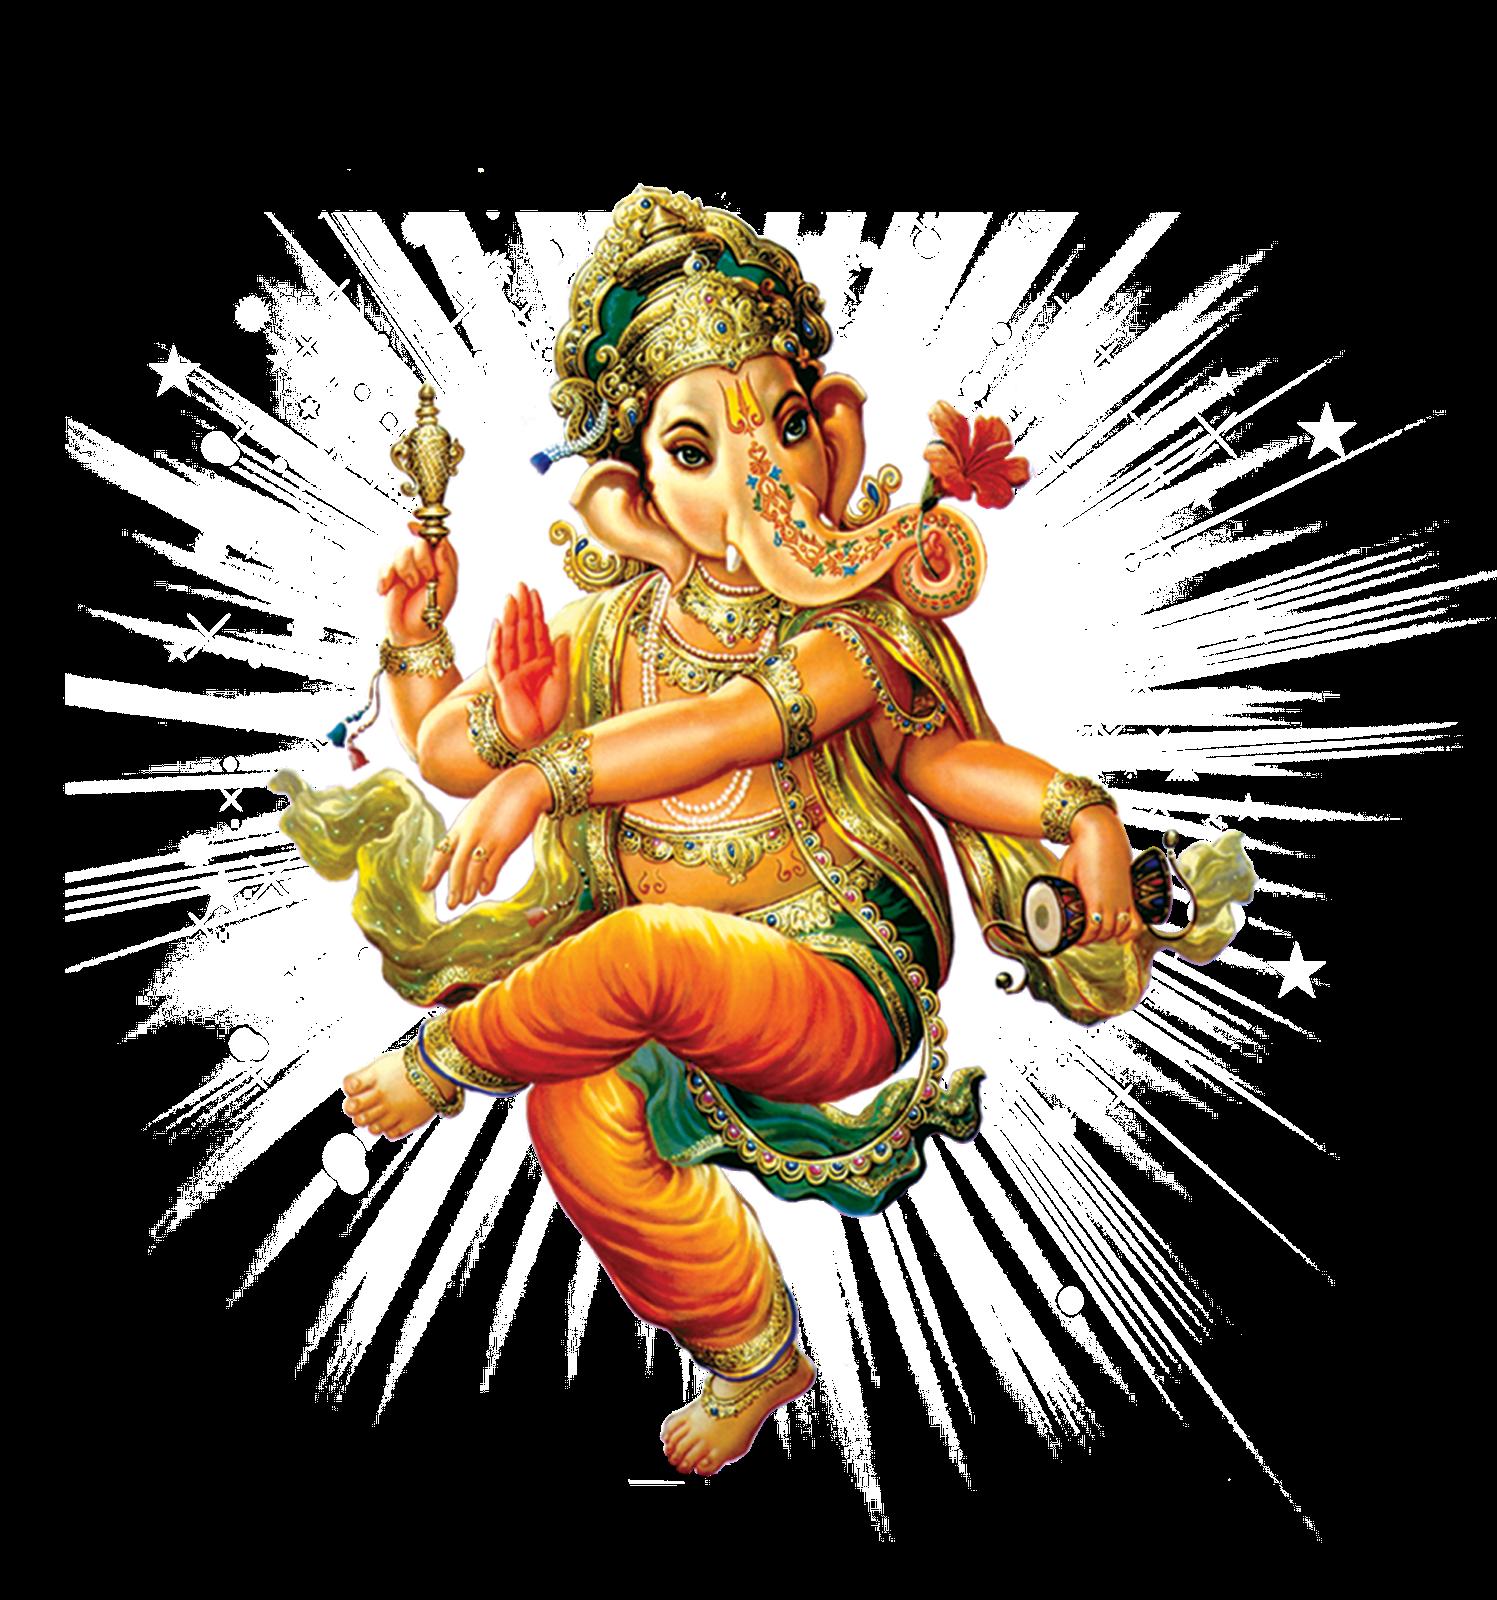 Sri Ganesh Png - Sri Ganesh Picture Png Image, Transparent background PNG HD thumbnail